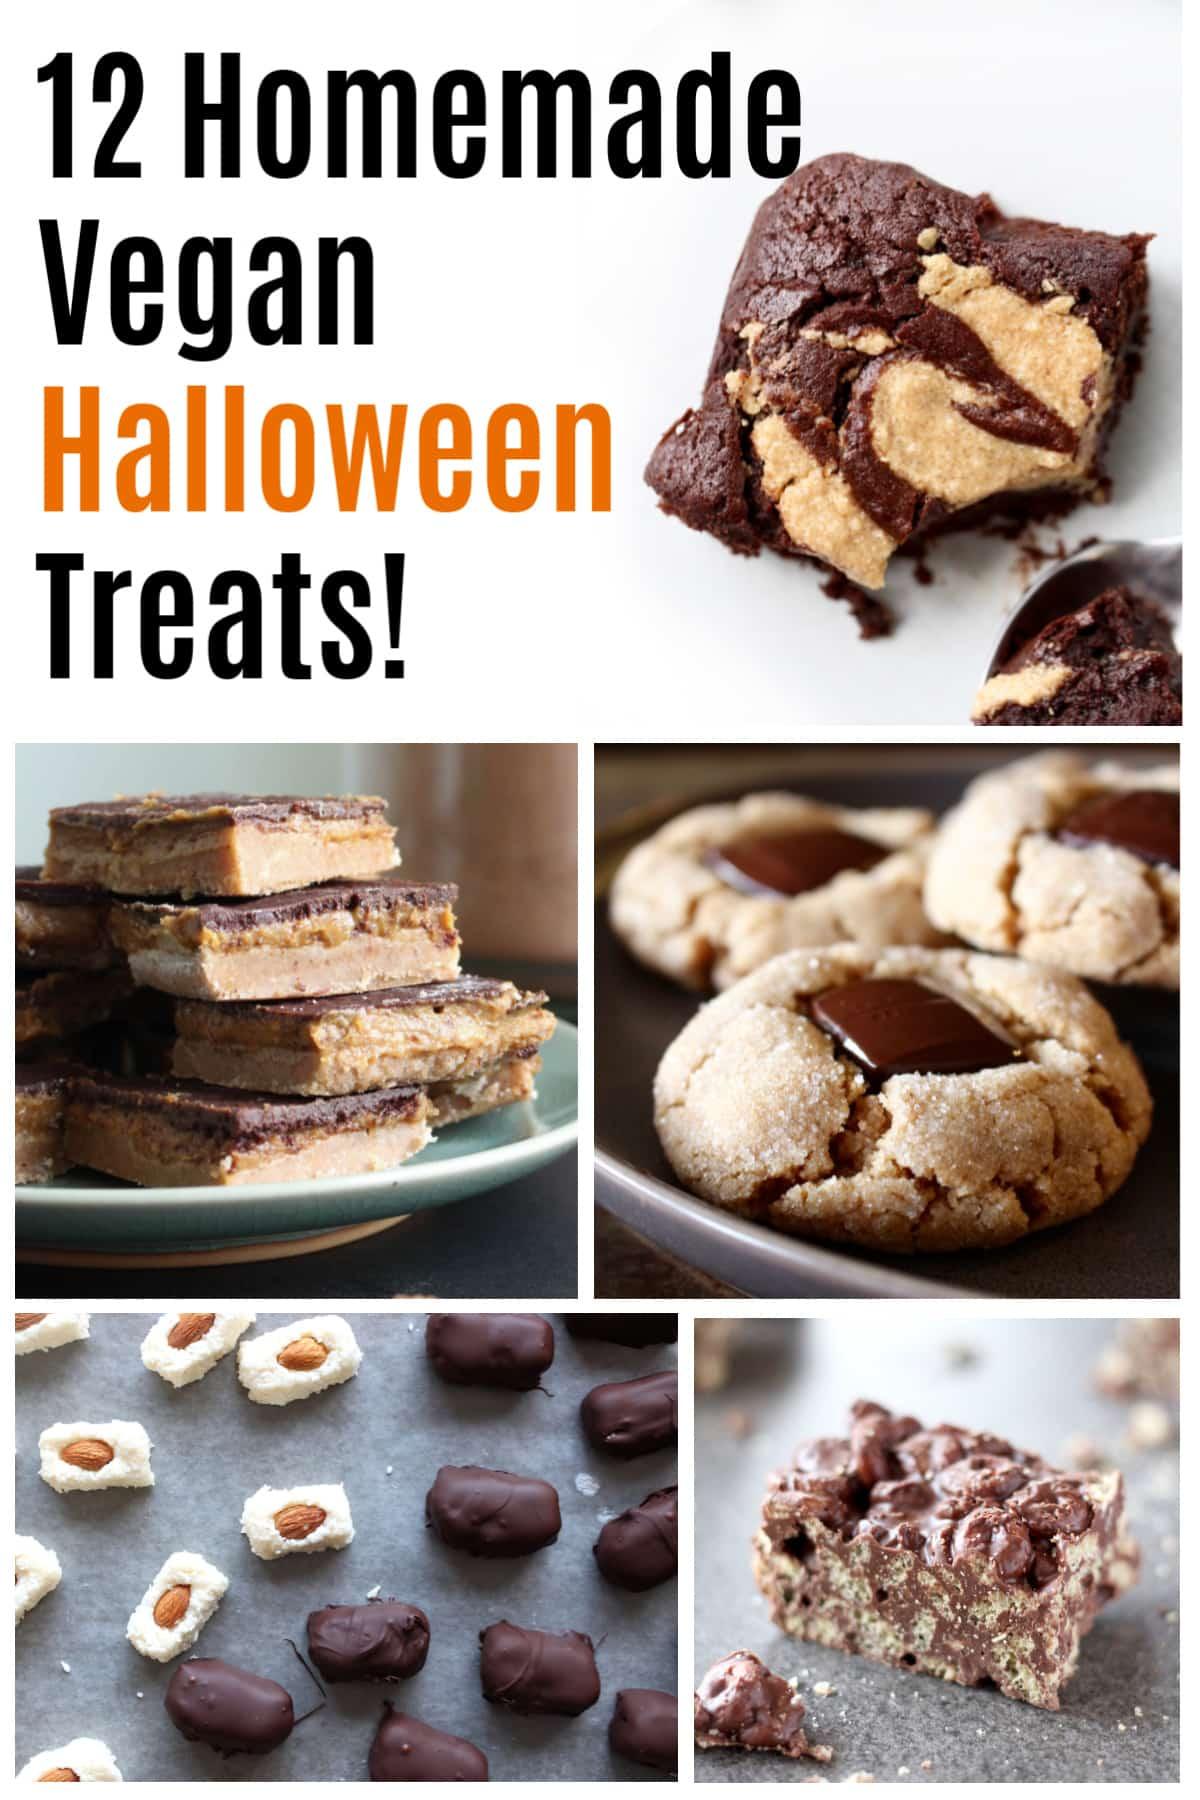 12 homemade Vegan Halloween recipes and treats!